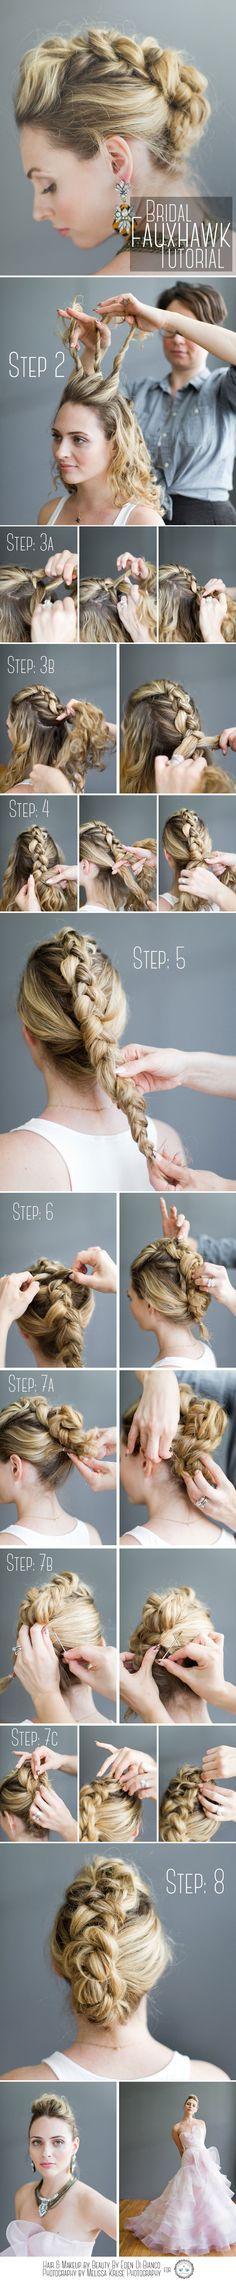 Braided faux hawk https://www.stonebridge.uk.com/course/hairdressing-qcf-diploma-level-3